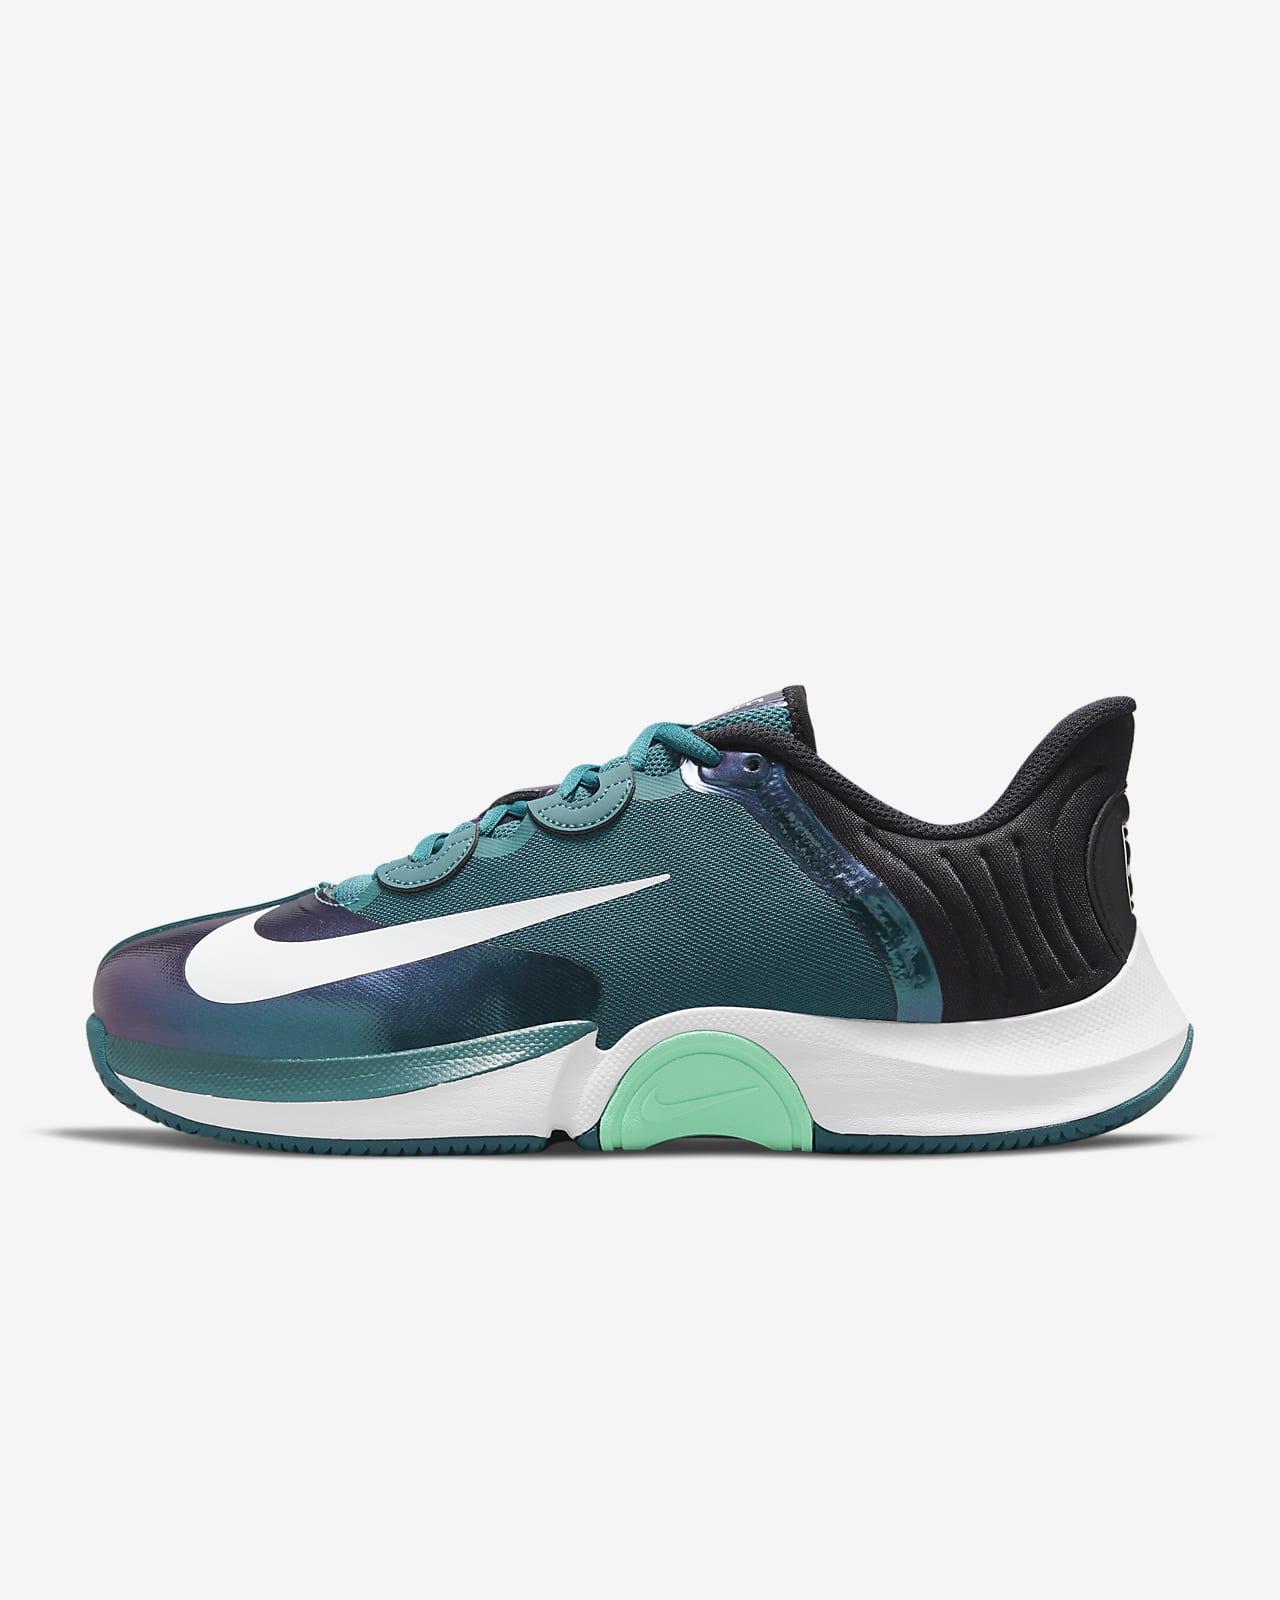 NikeCourt Air Zoom GP Turbo 男款硬地球場網球鞋